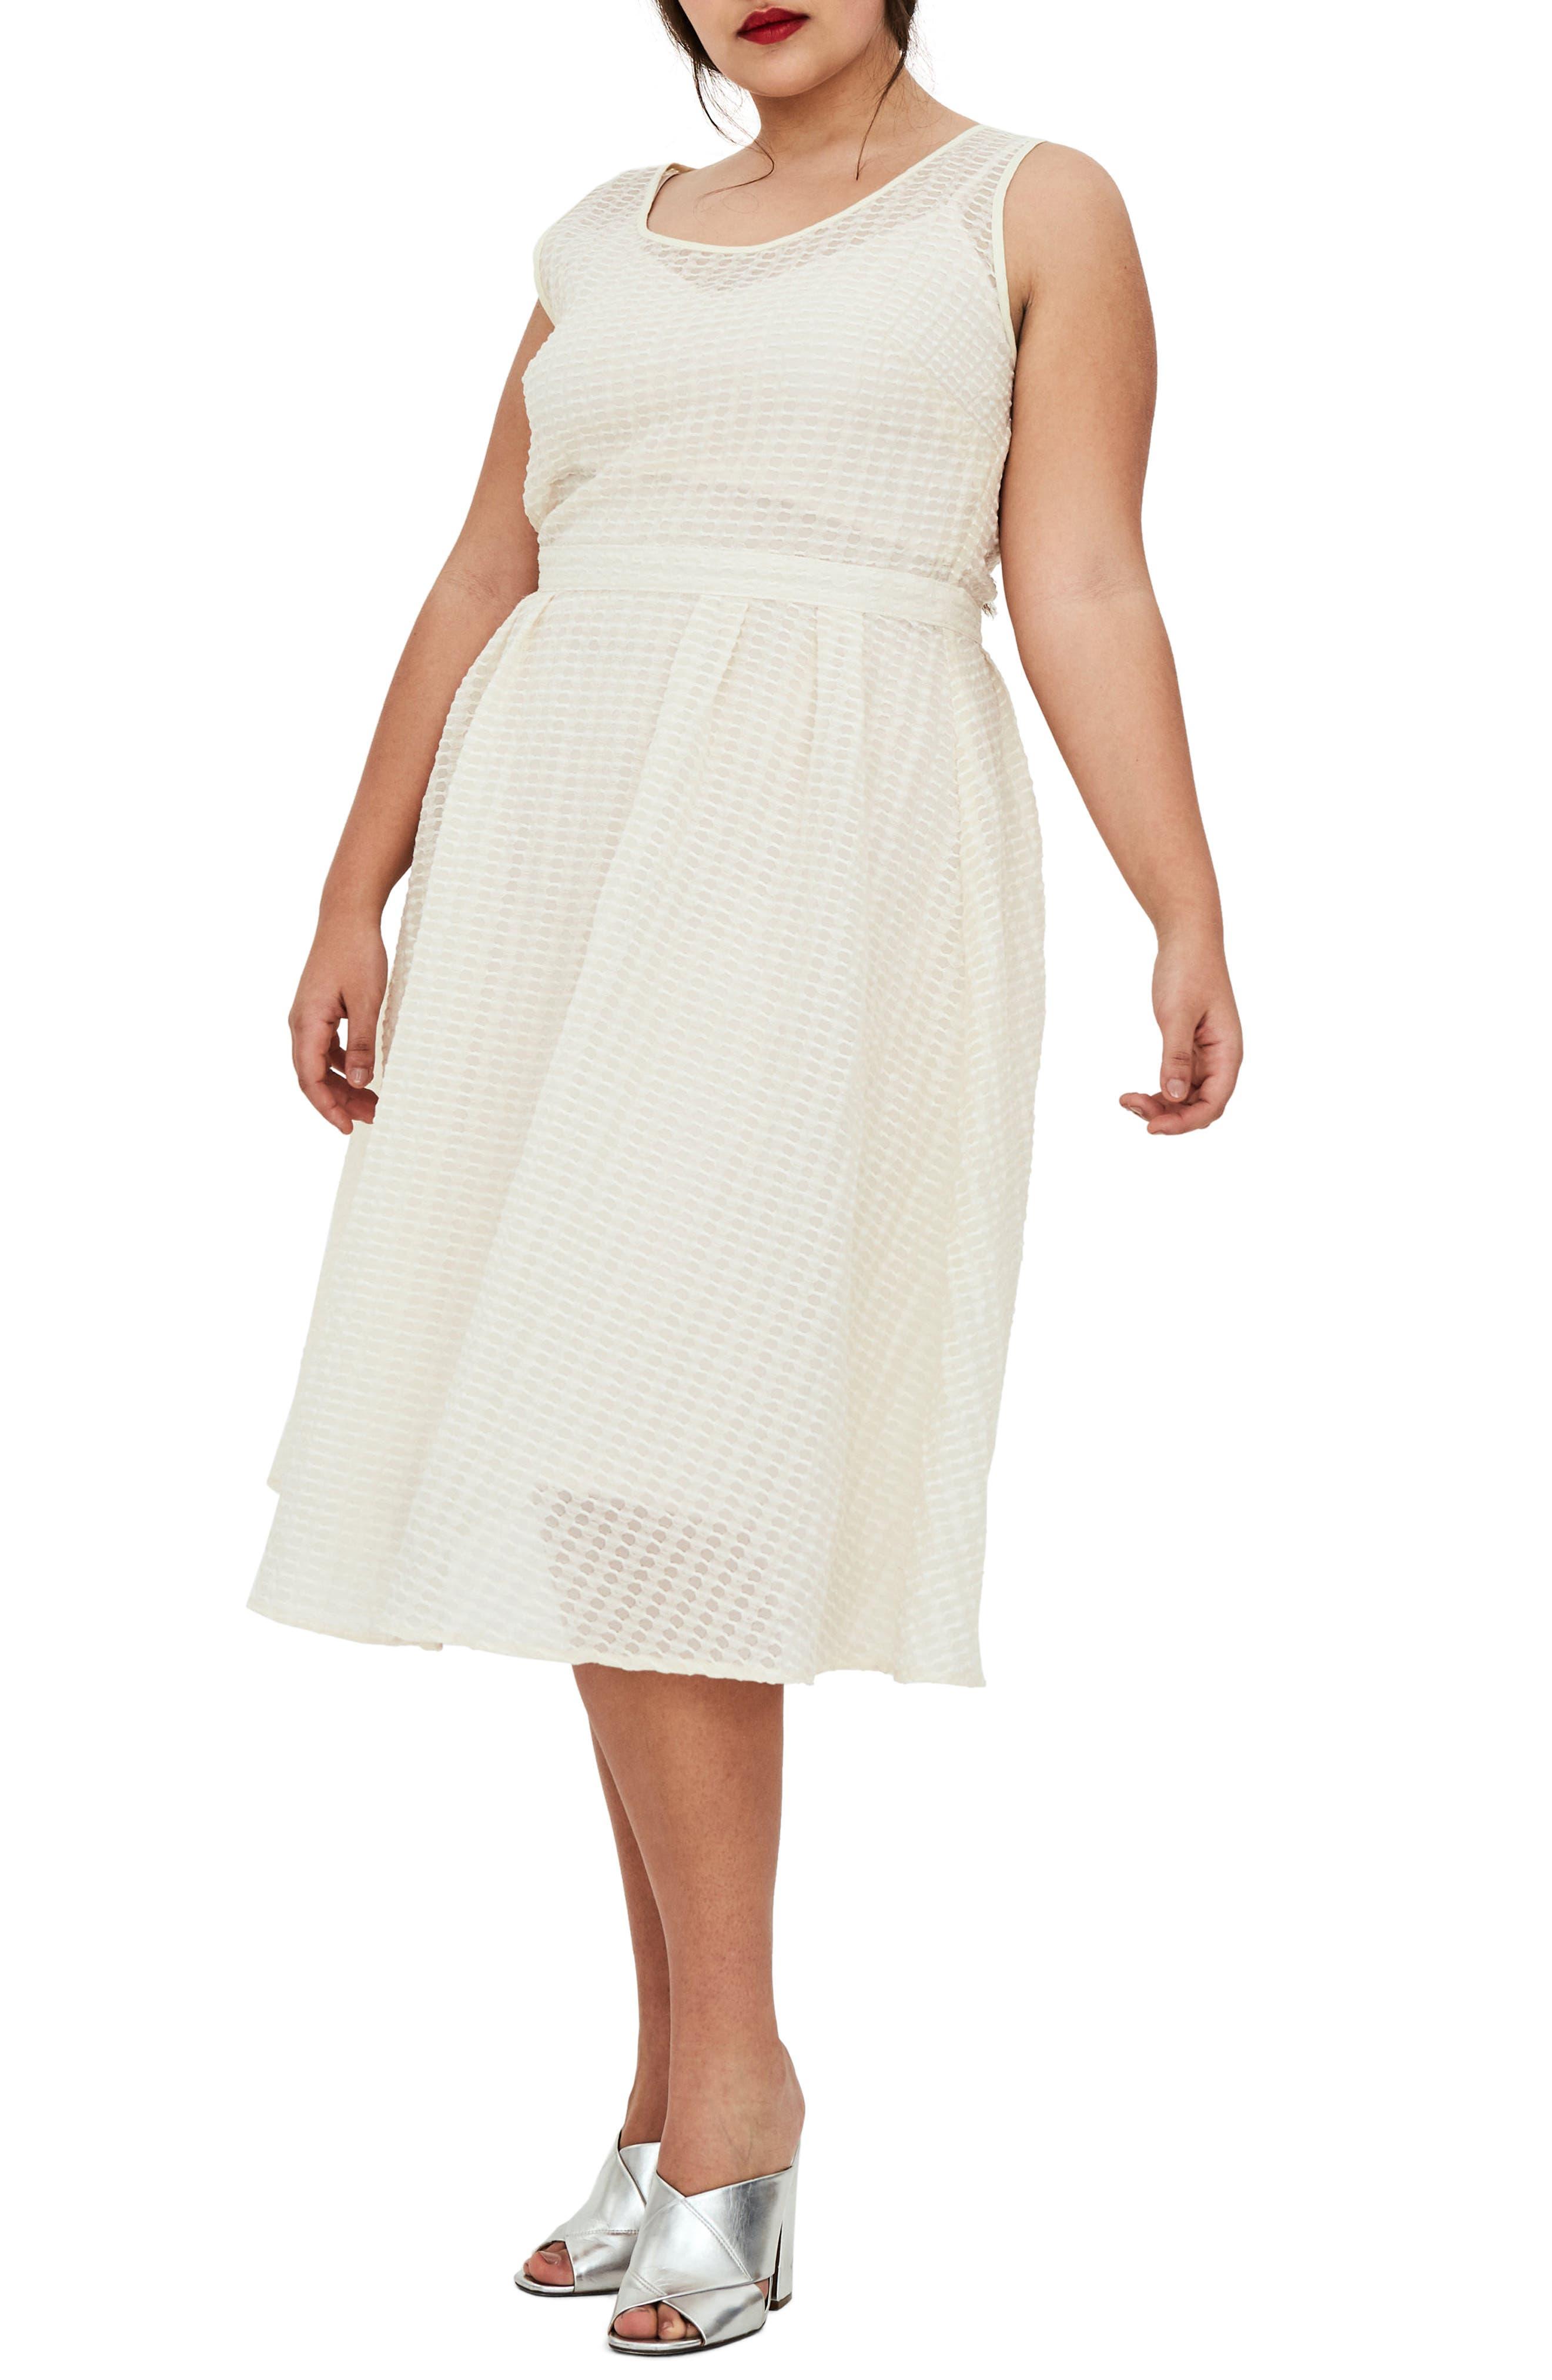 ELVI The Evelyn Textured Midi Dress (Regular & Plus Size)